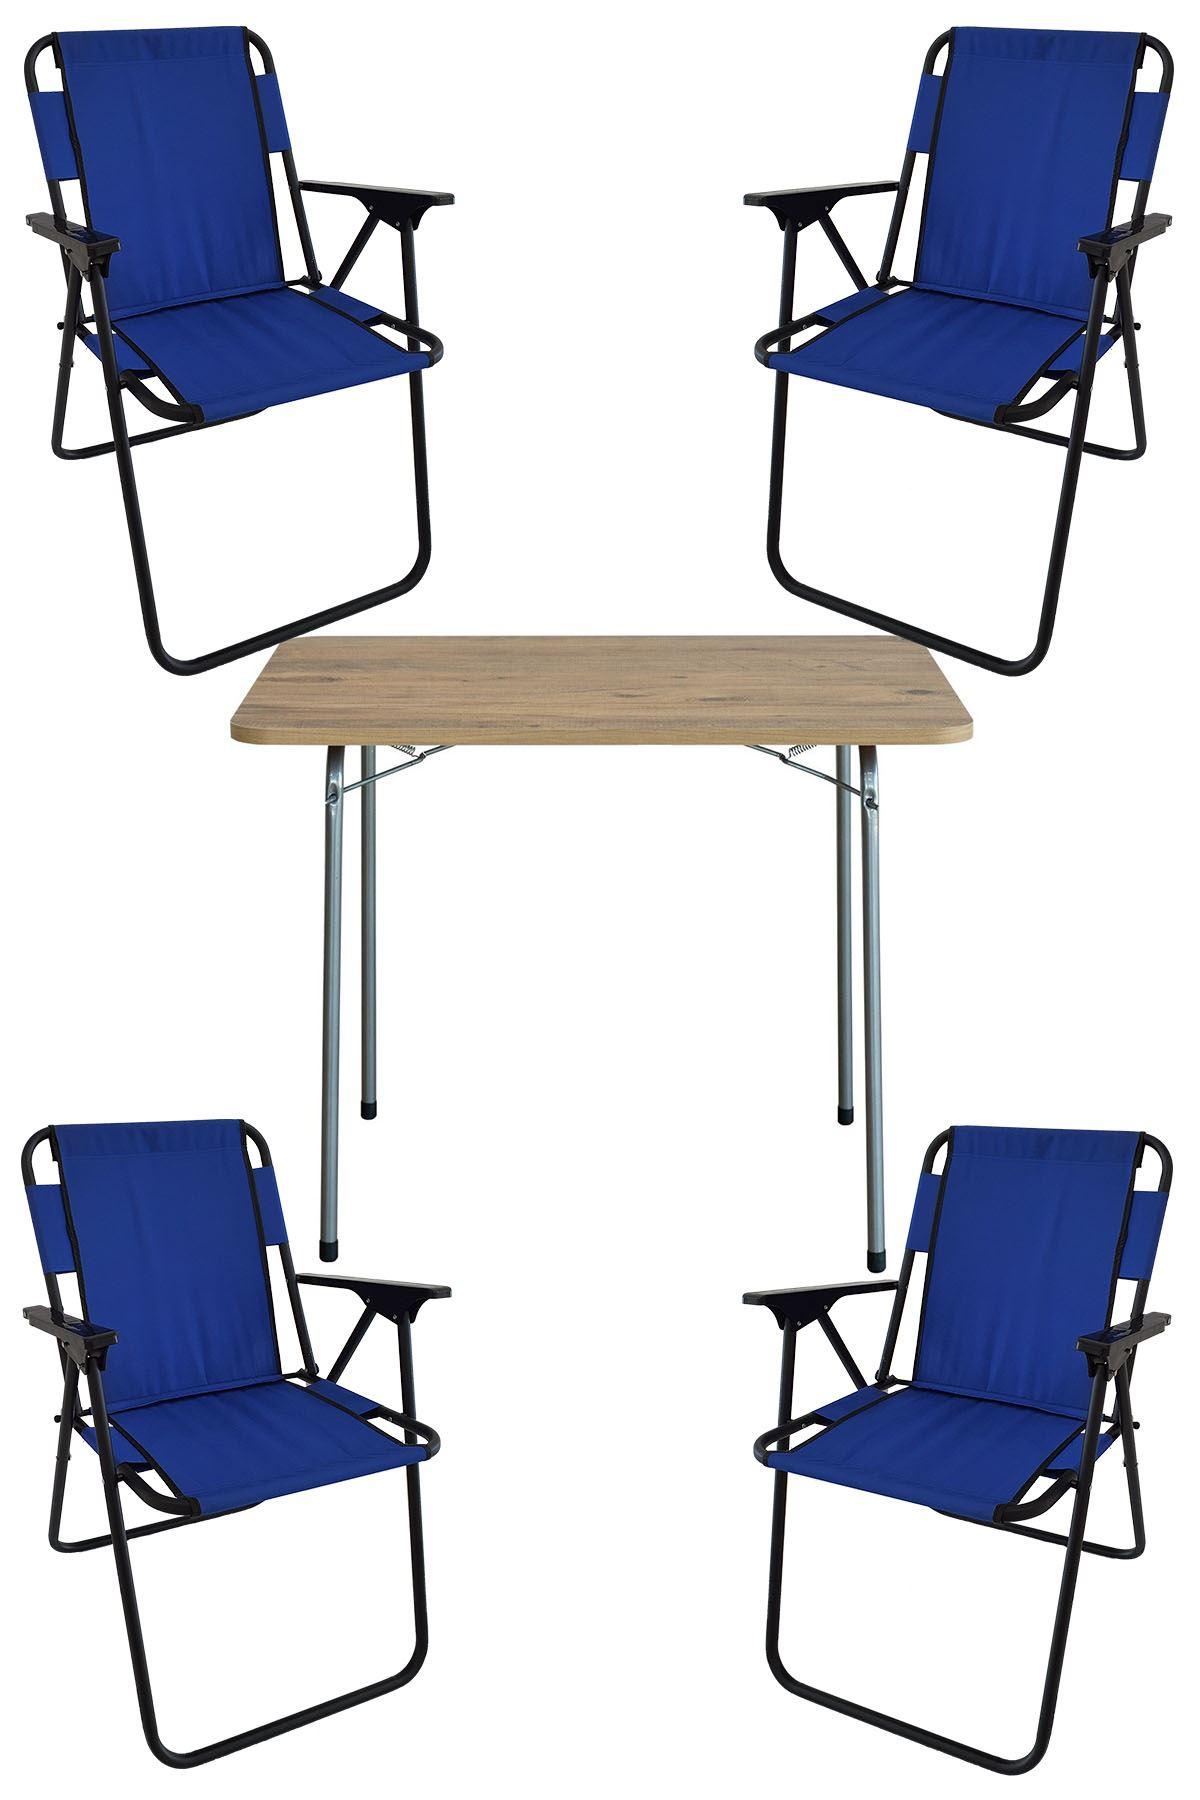 Bofigo 60X80 Pine Patterned Folding Table + 4 Pieces Folding Chair Camping Set Garden Set Blue